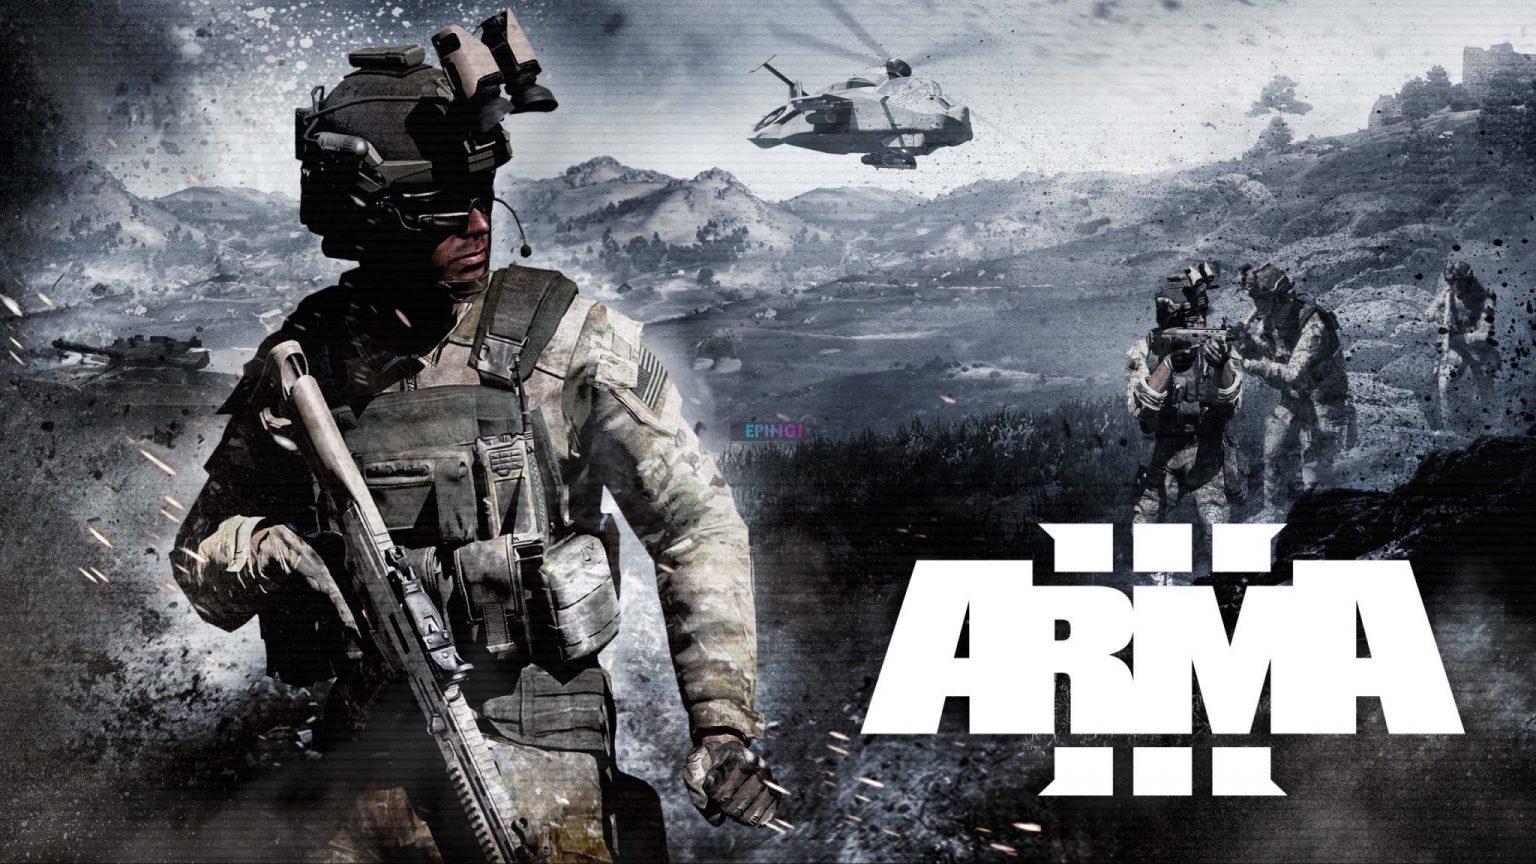 Arma 3 Xbox One iOS Latest Version Free Download